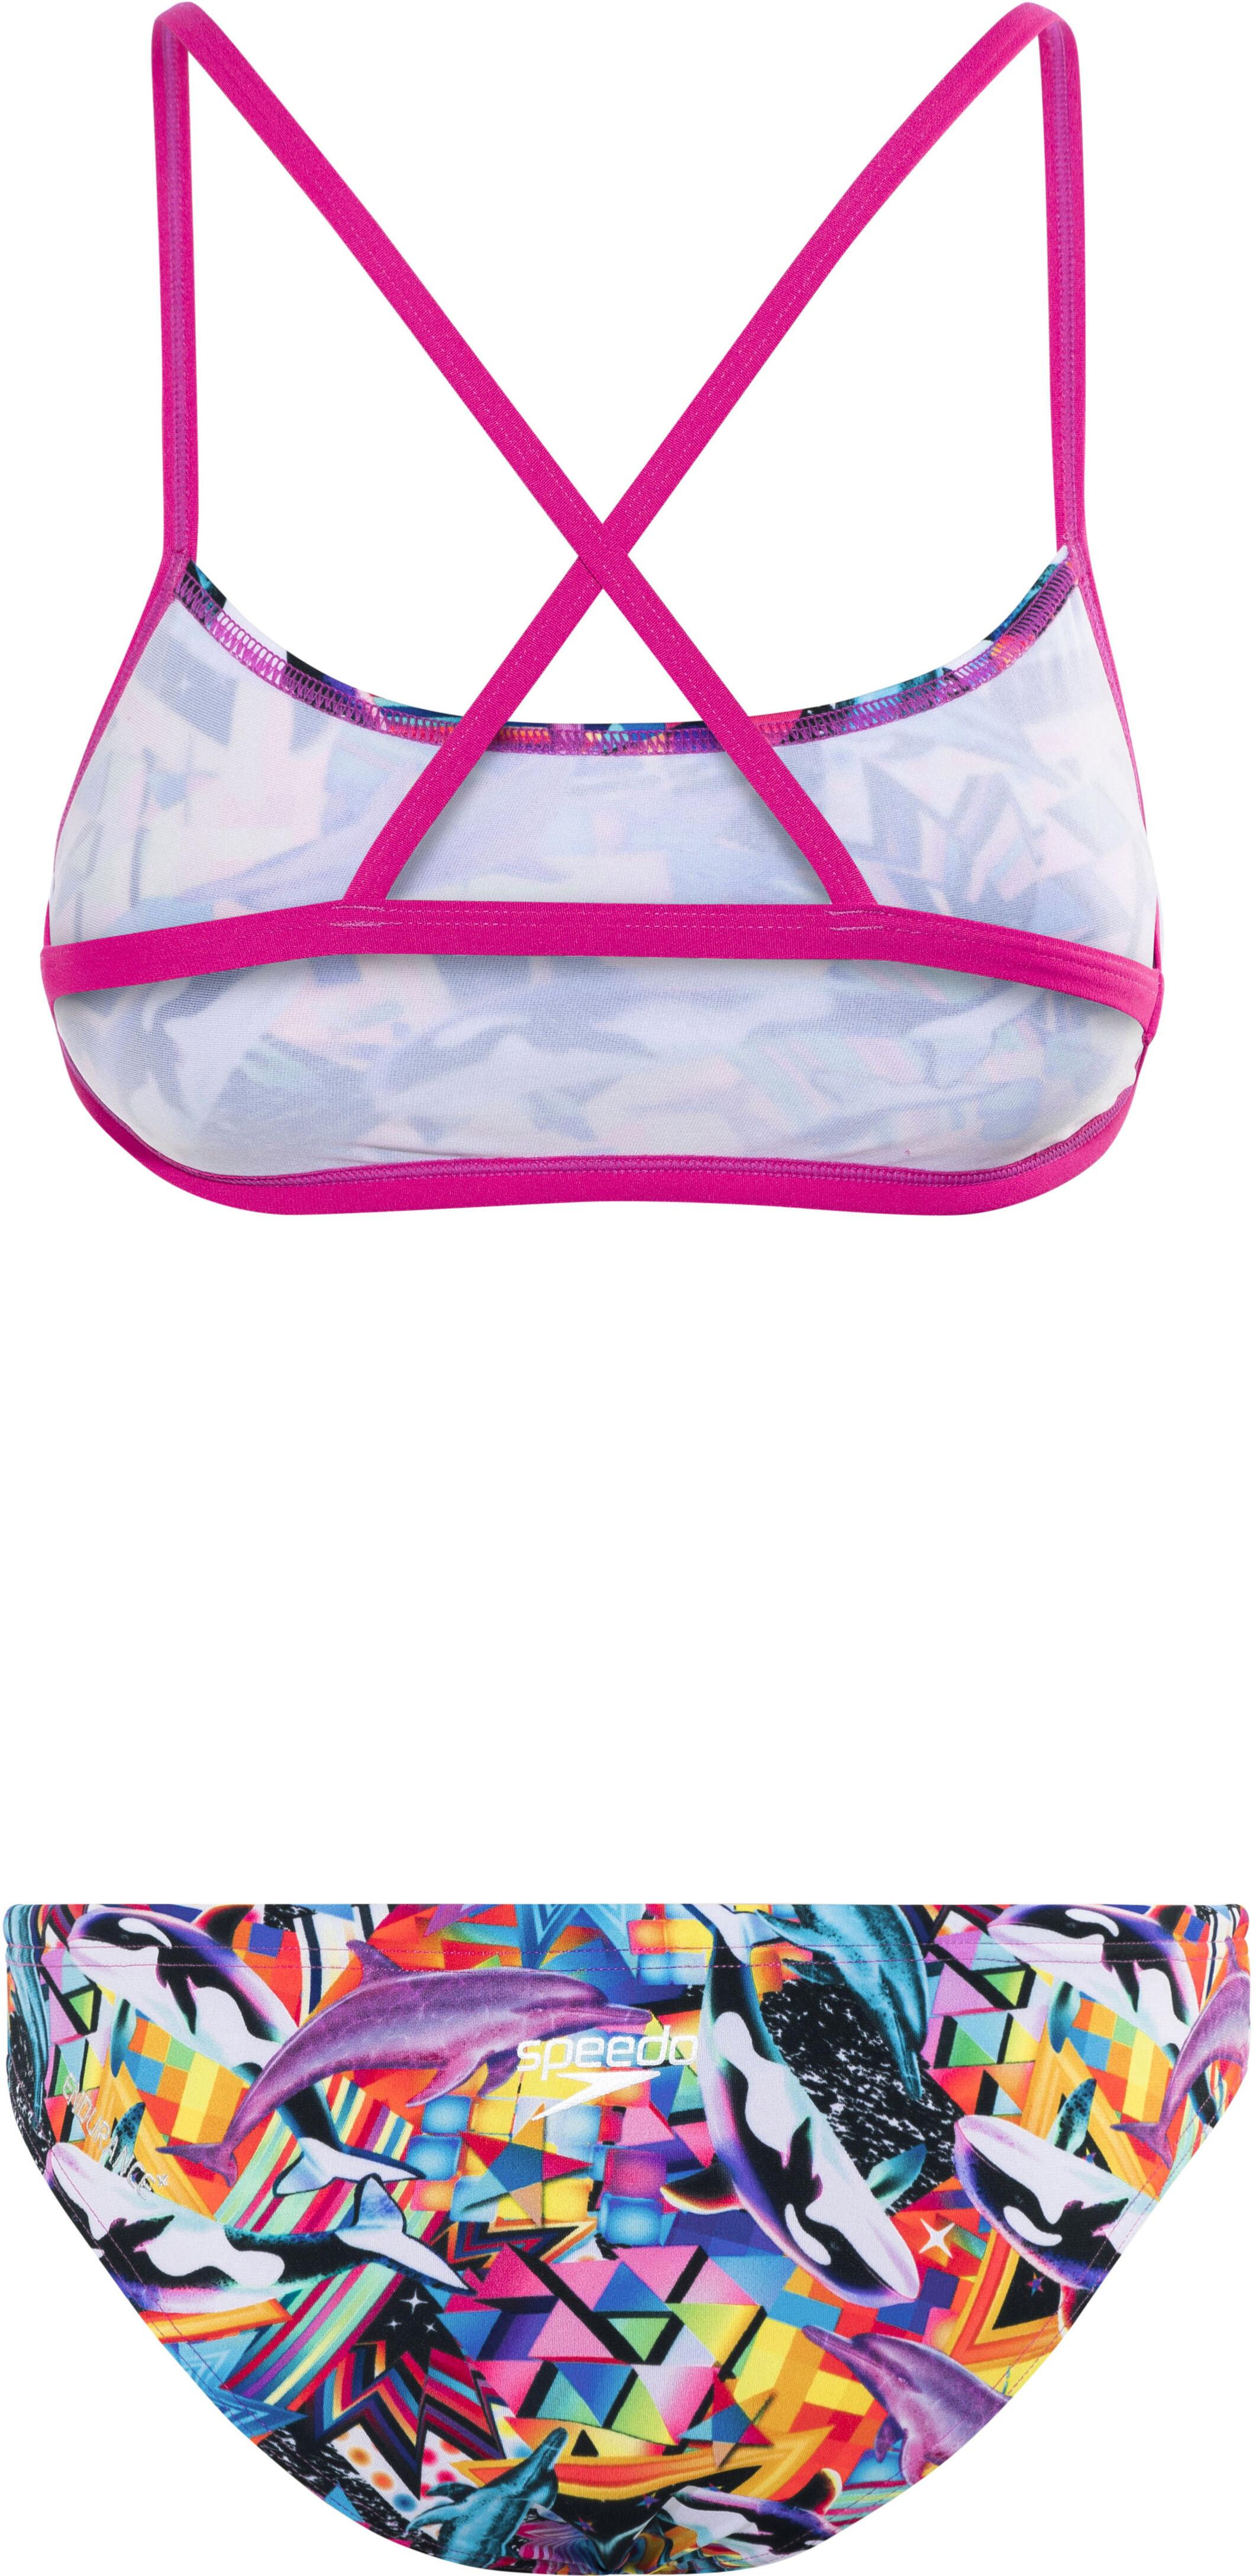 speedo Digi 2 Piece Bikini Dam flerfärgad - till fenomenalt pris på ... 0d5b09347ddd0